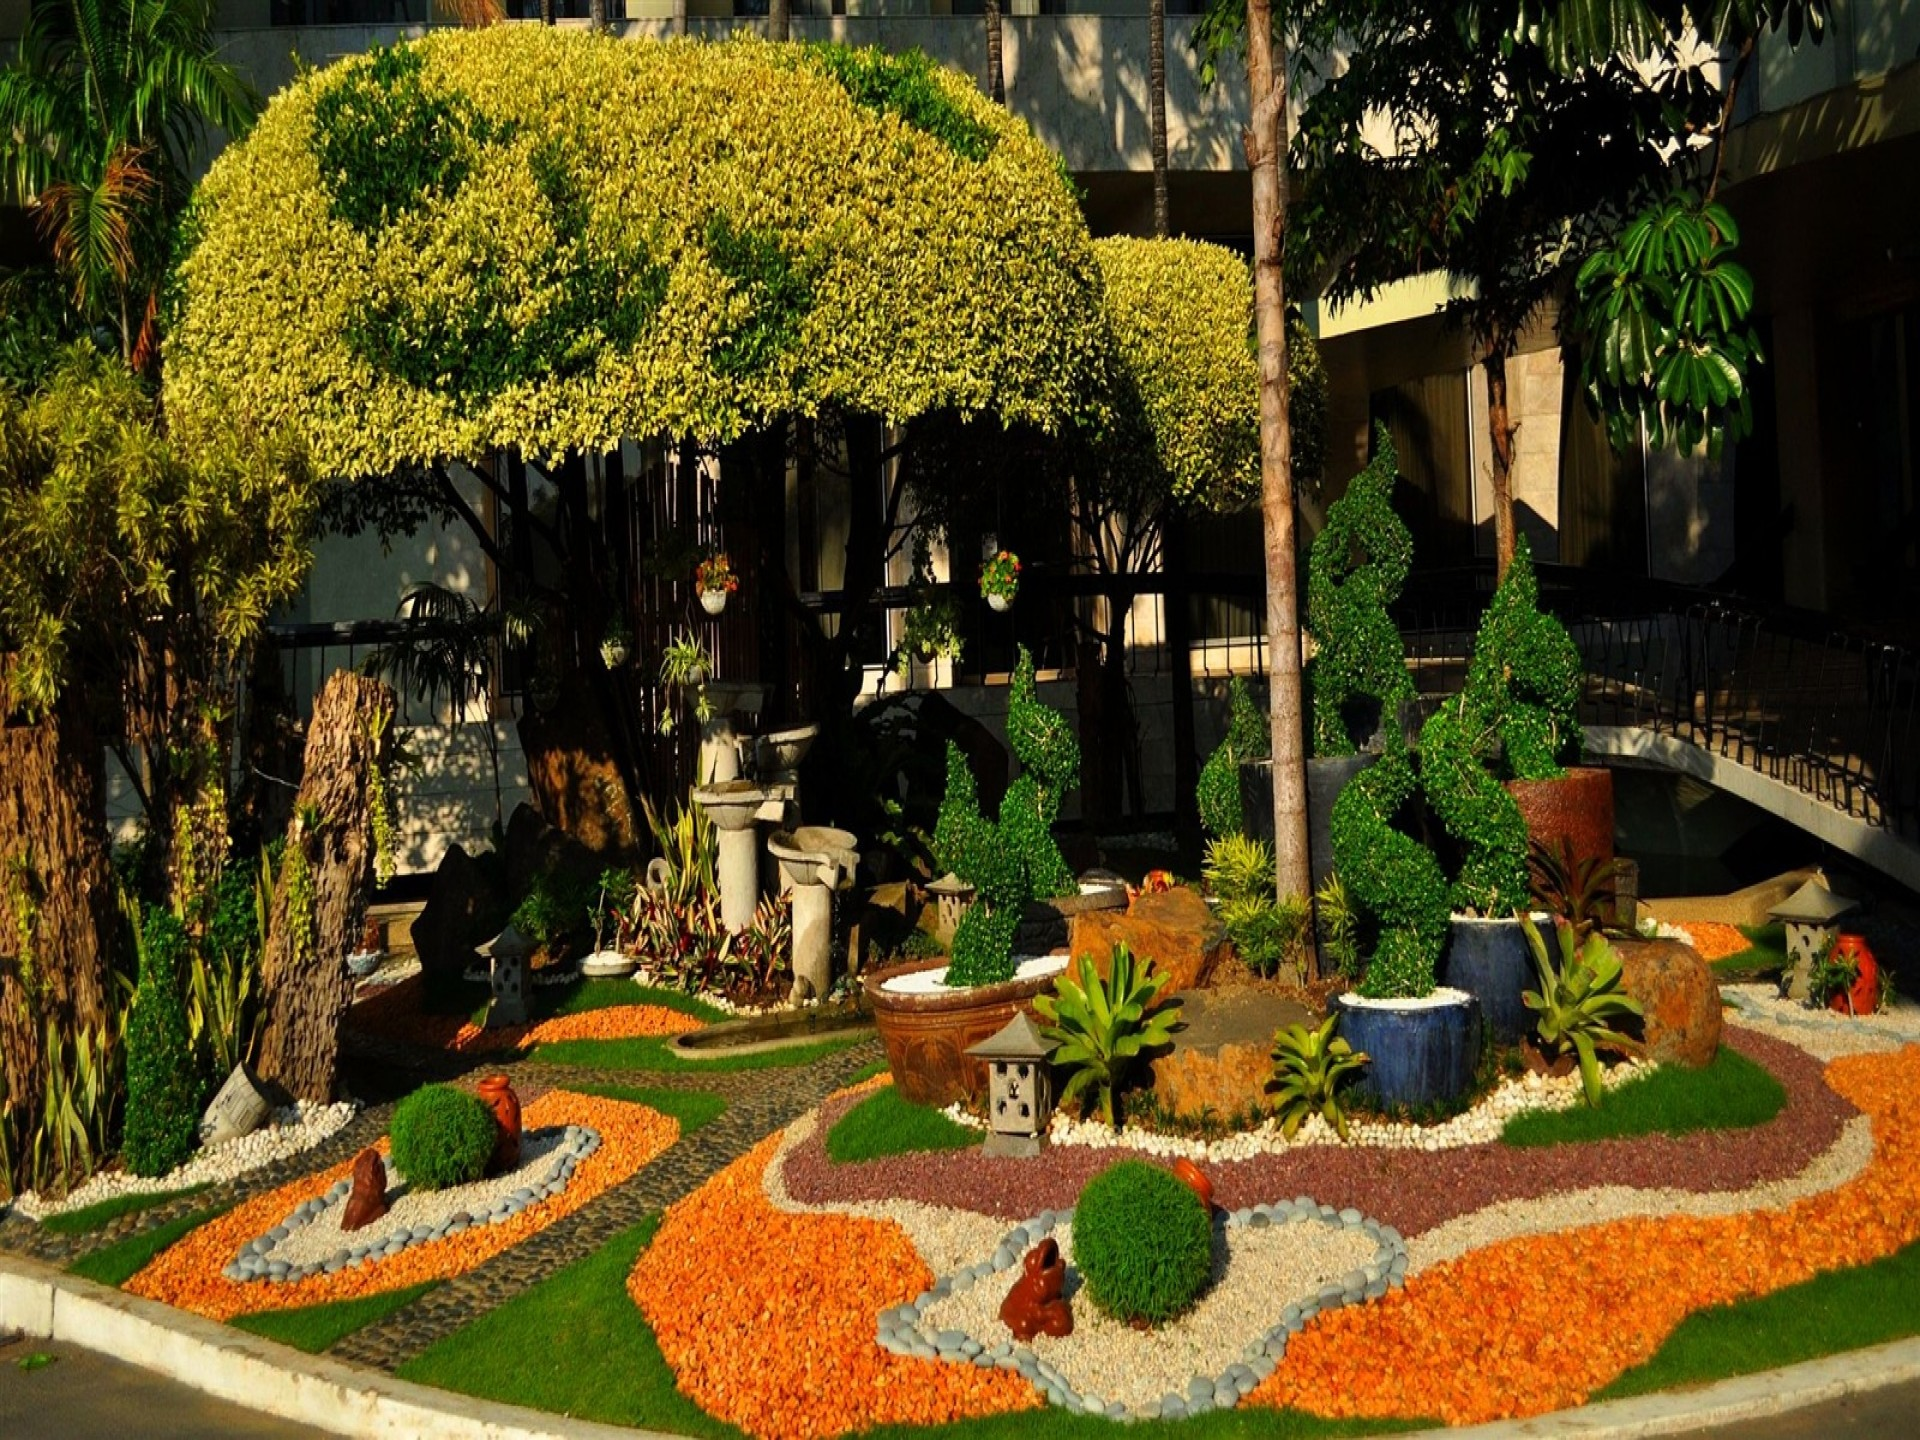 Zen Garden Wallpaper 3 Freetopwallpaper